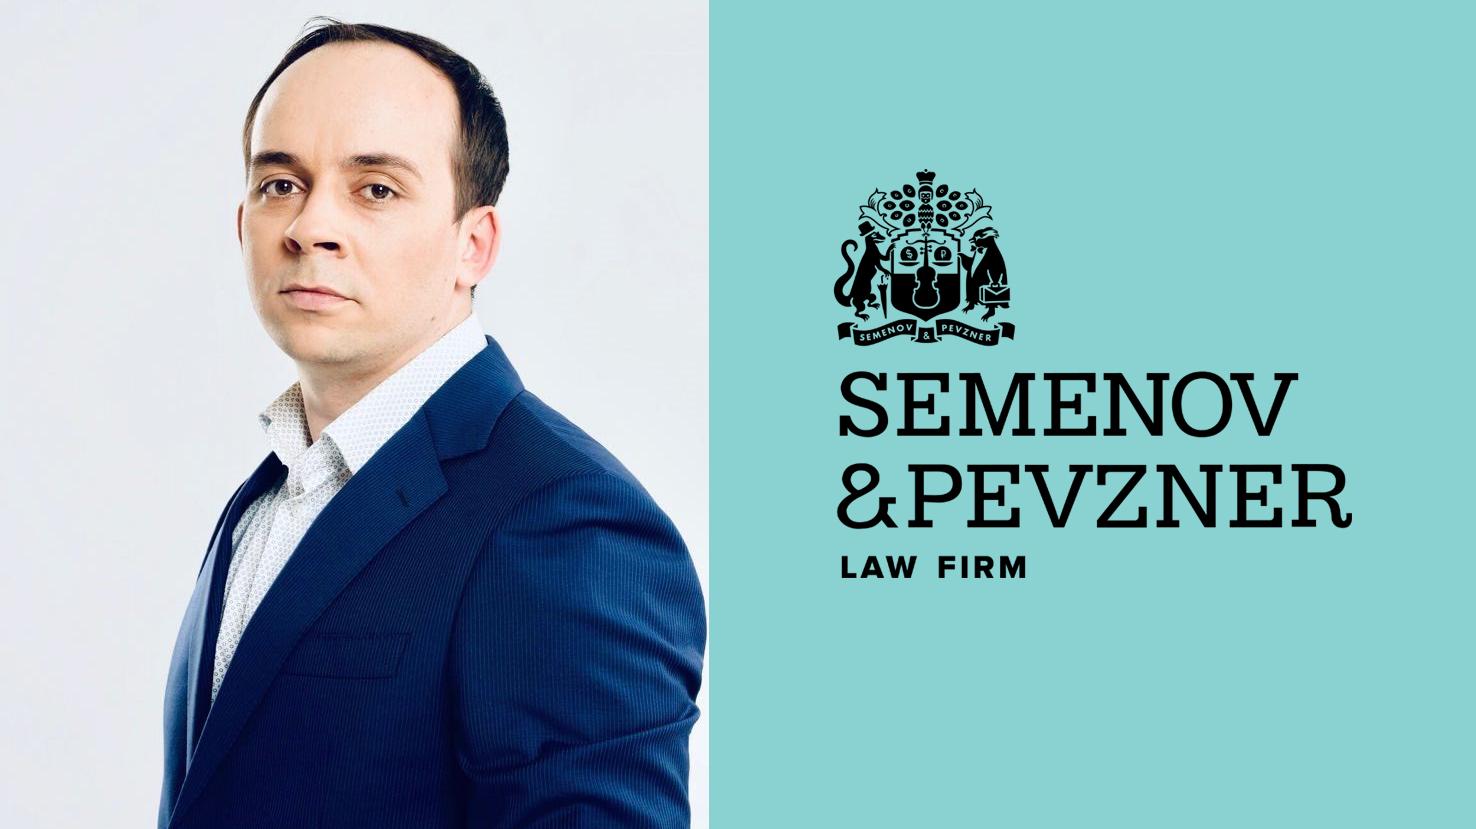 Итоги 2020: Роман Лукьянов из Semenov & Pevzner о главном за год